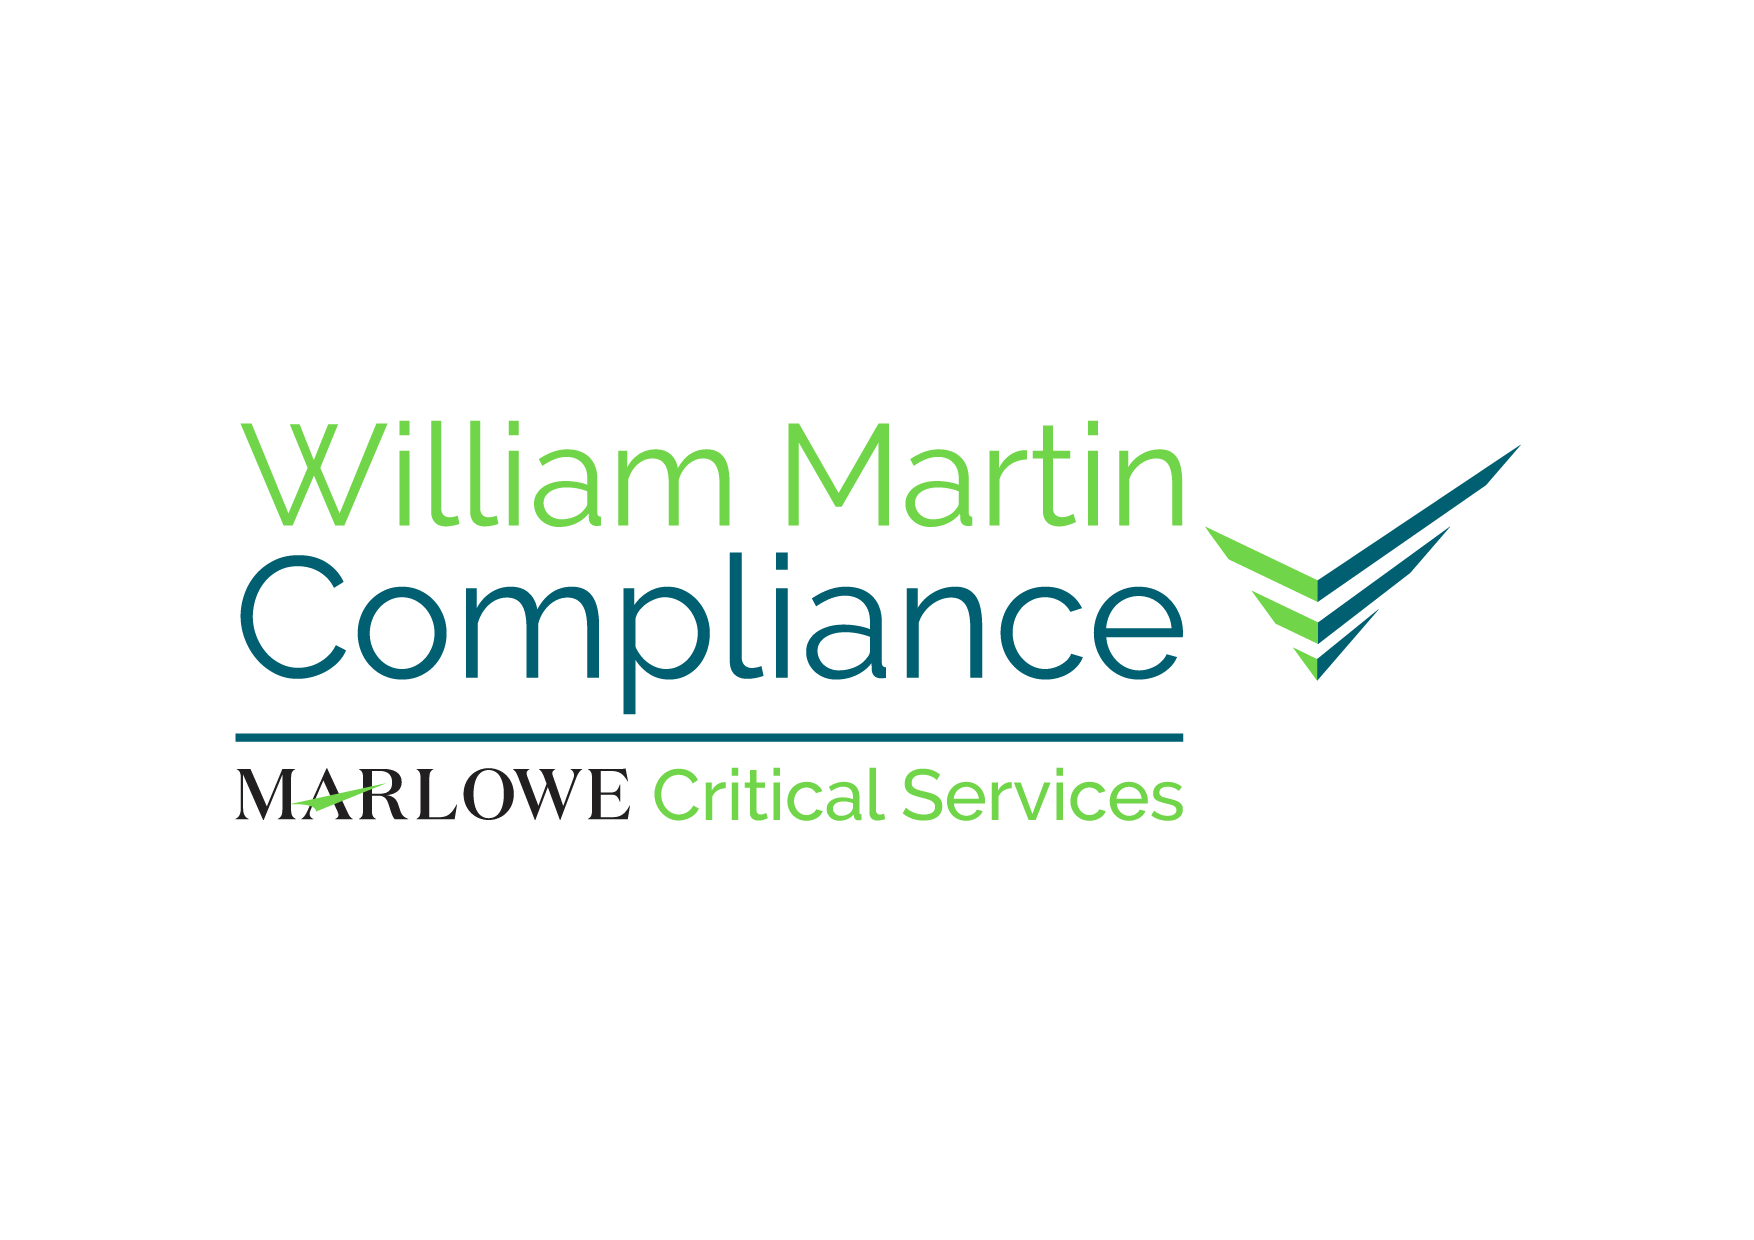 William Martin Compliance Ltd